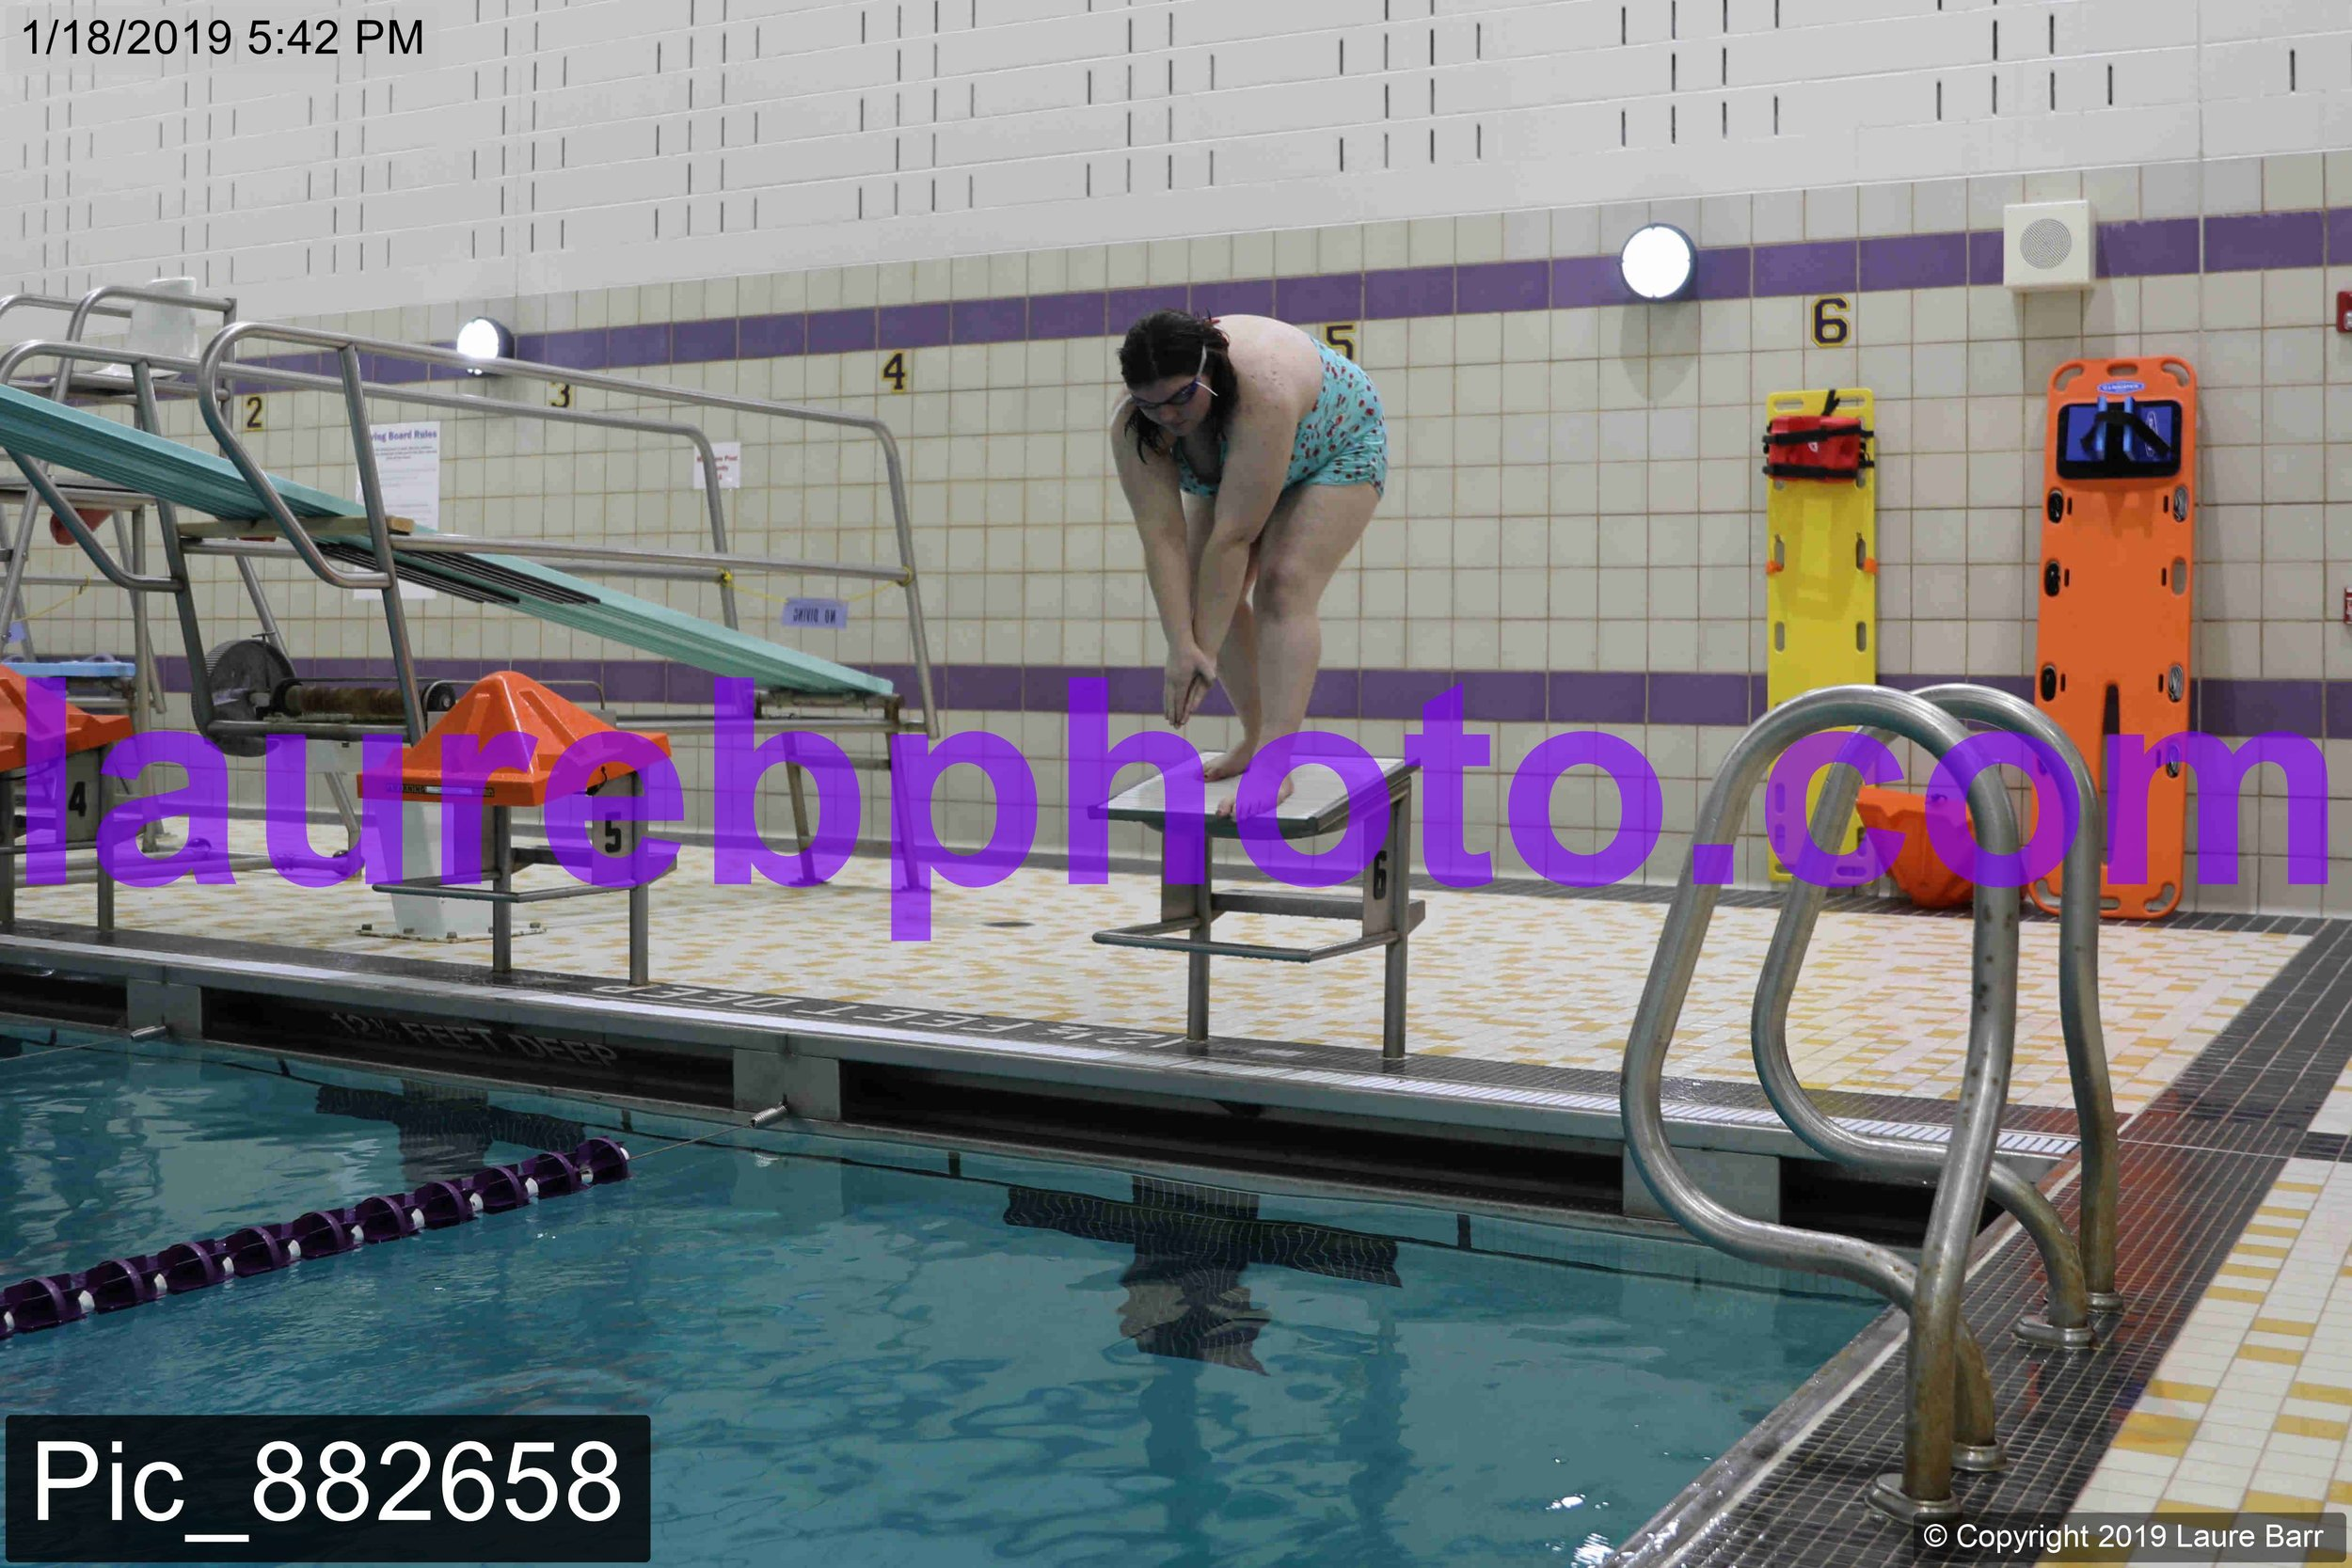 Pic_882658.jpg